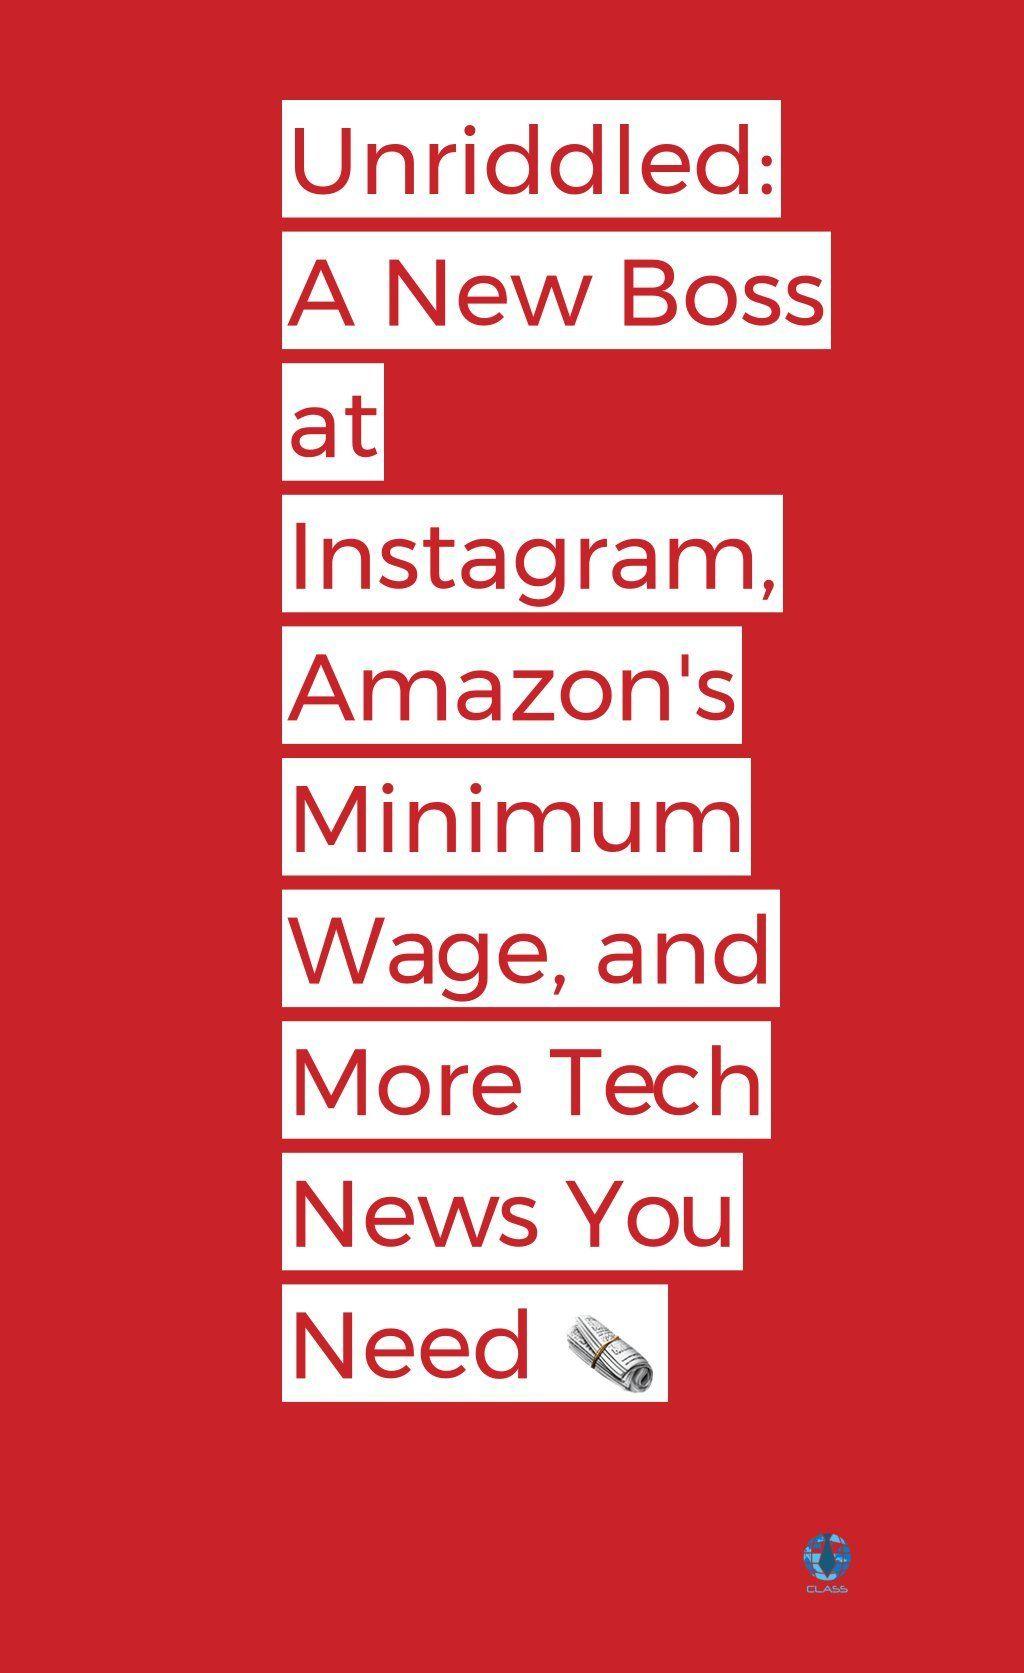 Unriddled A New Boss at Instagram, Amazon's MinimumWage